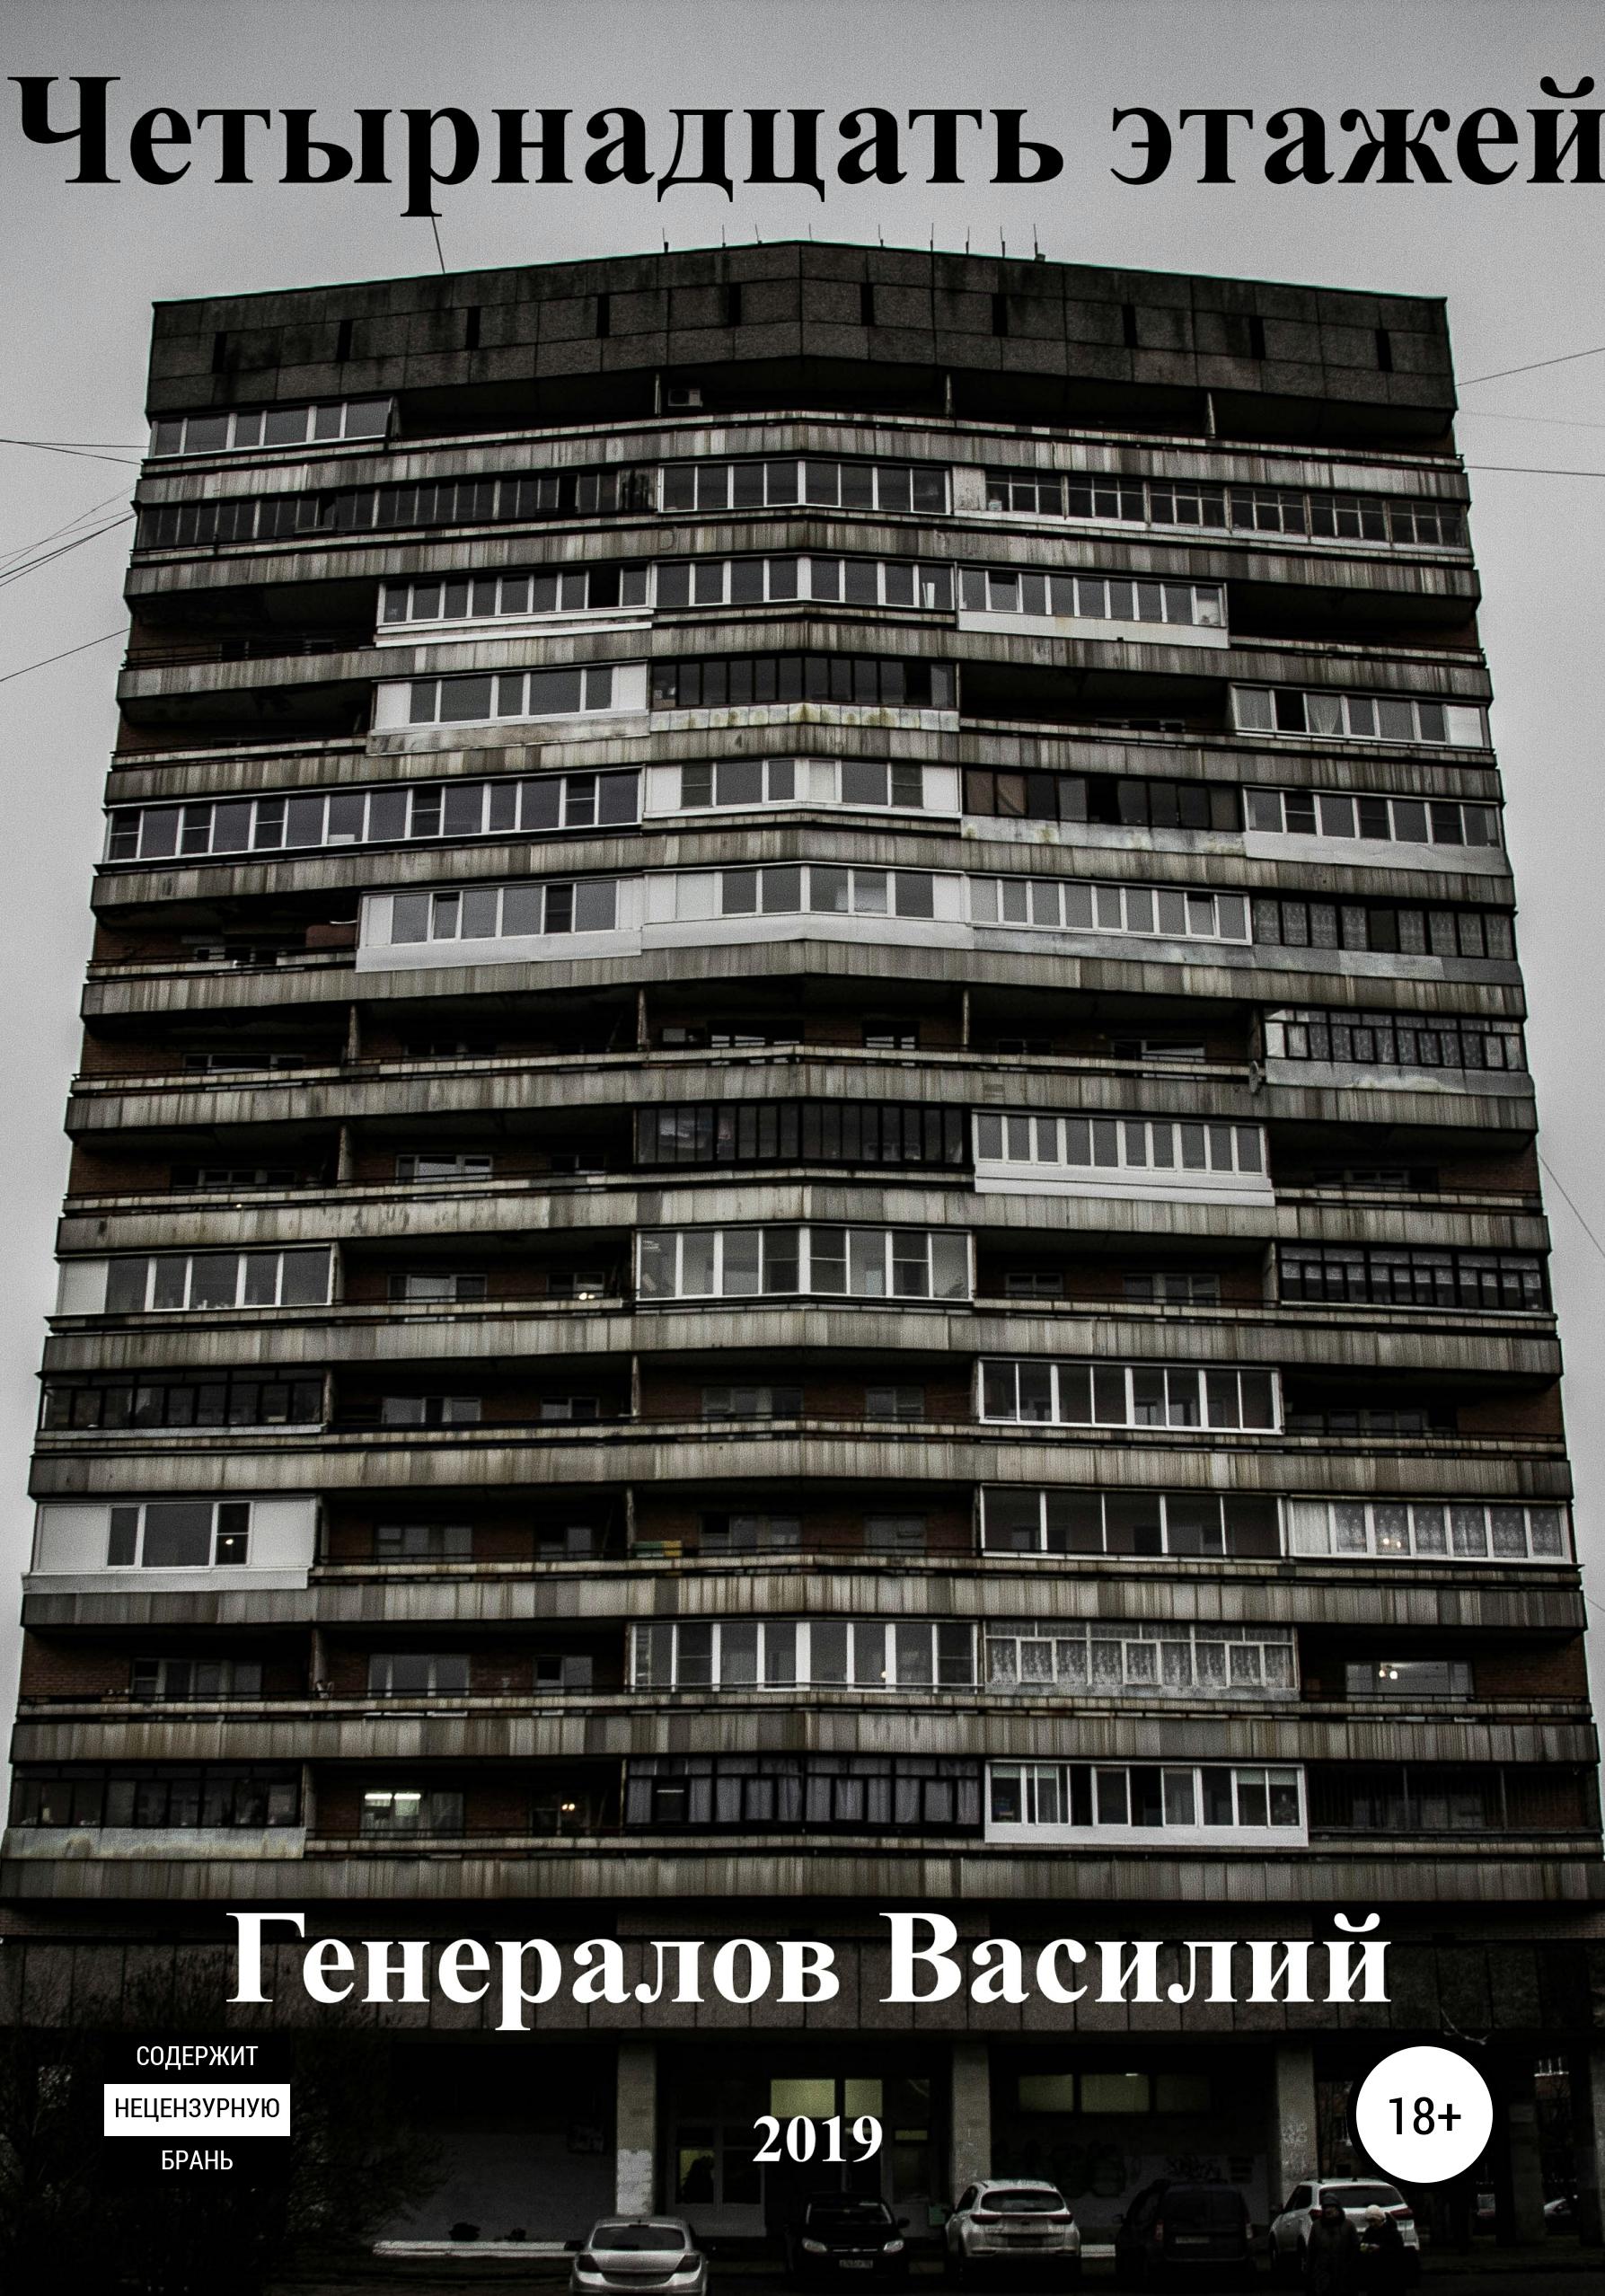 Четырнадцать этажей